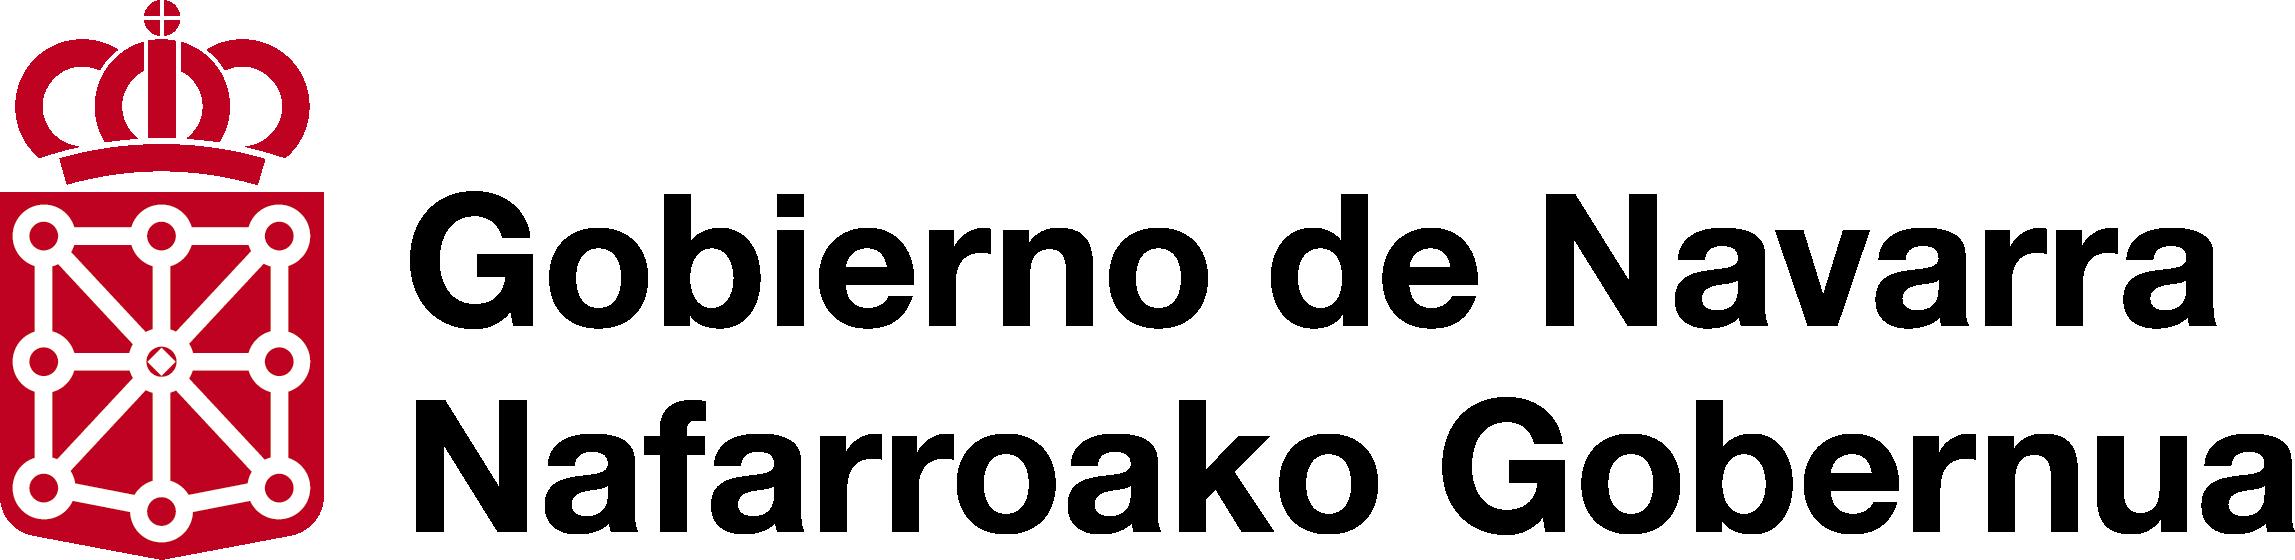 GN-v2-2c